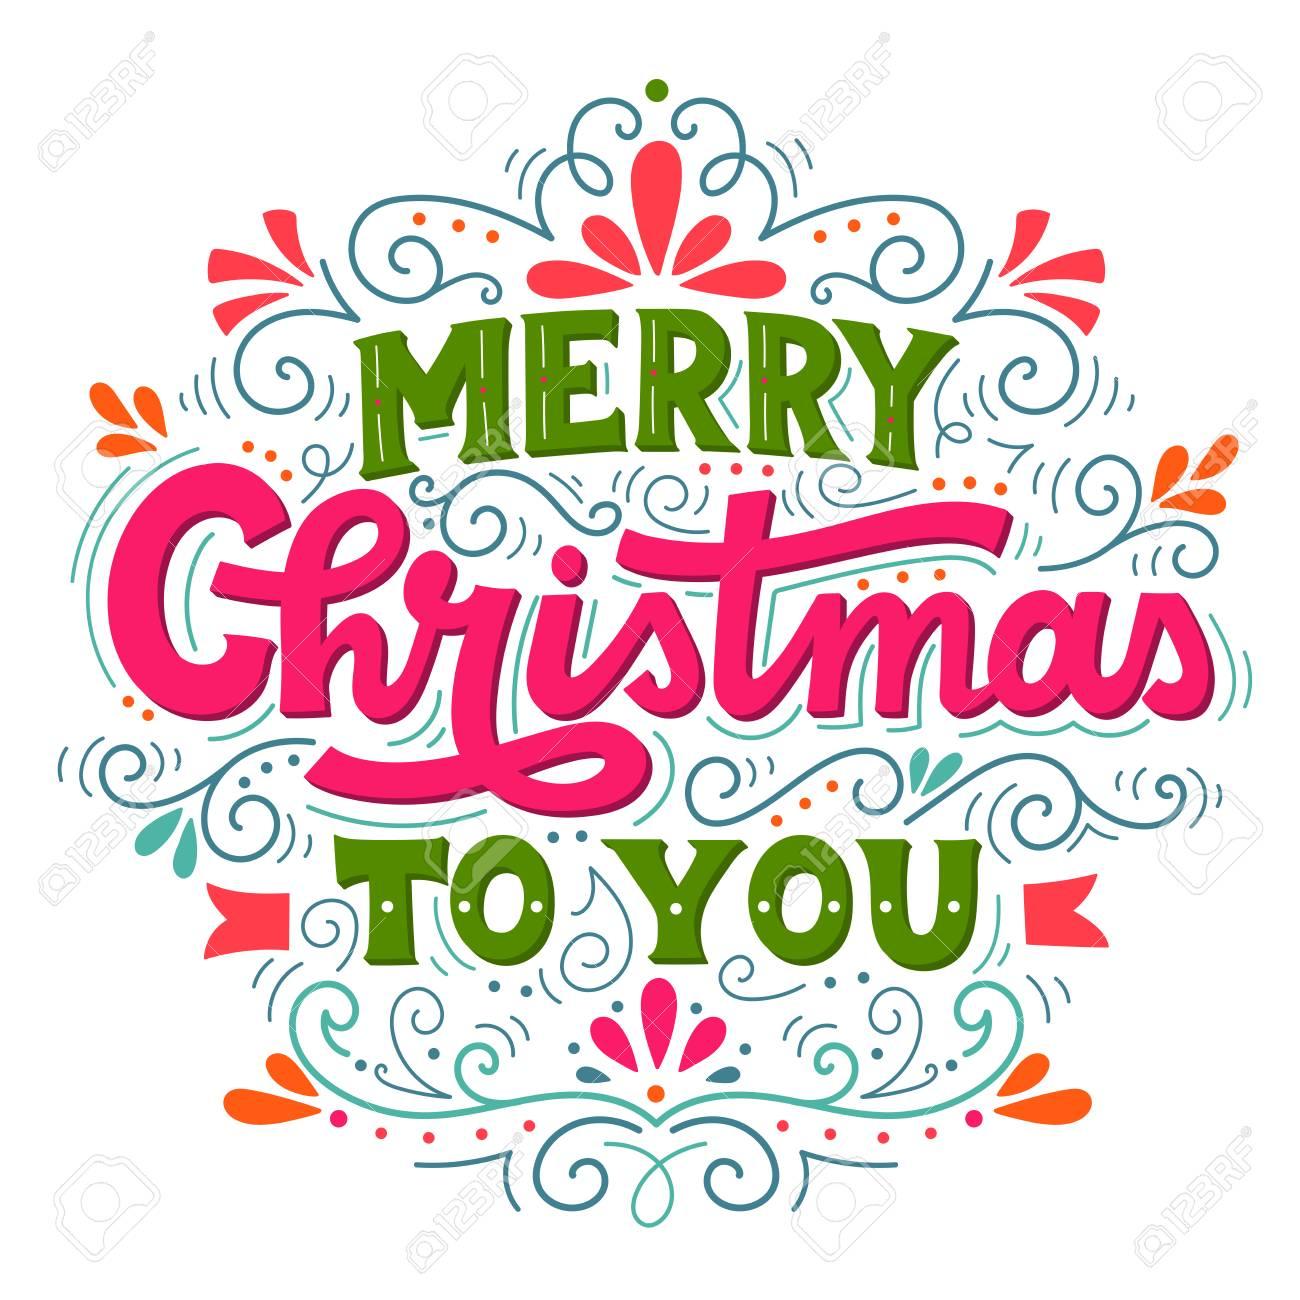 Merry Christmas To You.Merry Christmas To You Hand Drawn Winter Holiday Image Christmas